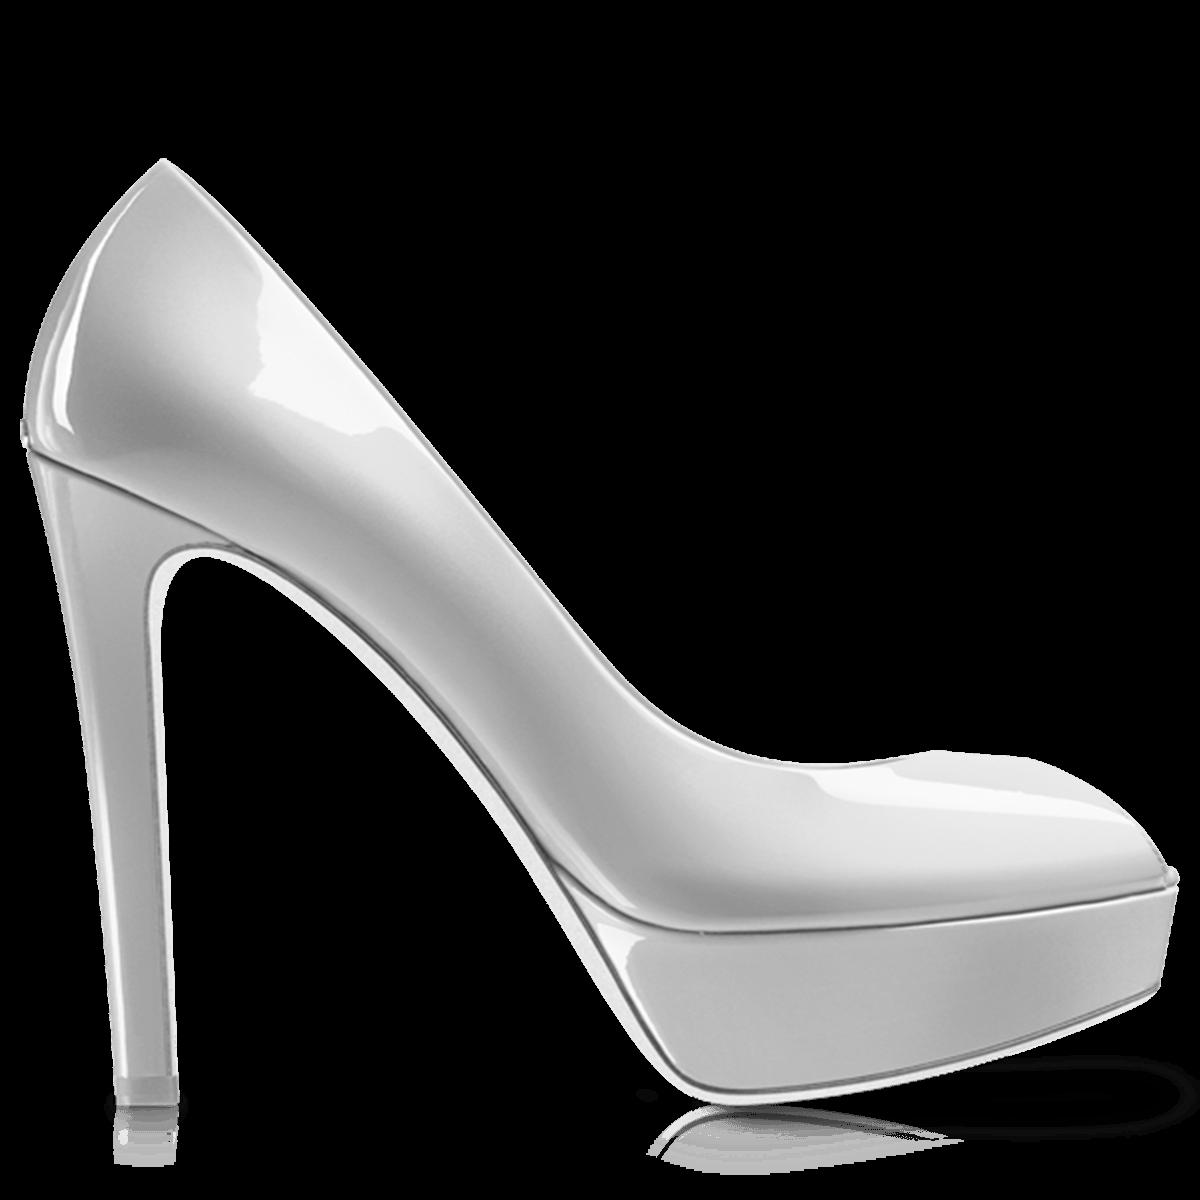 image freeuse download White Heel Women Shoe transparent PNG